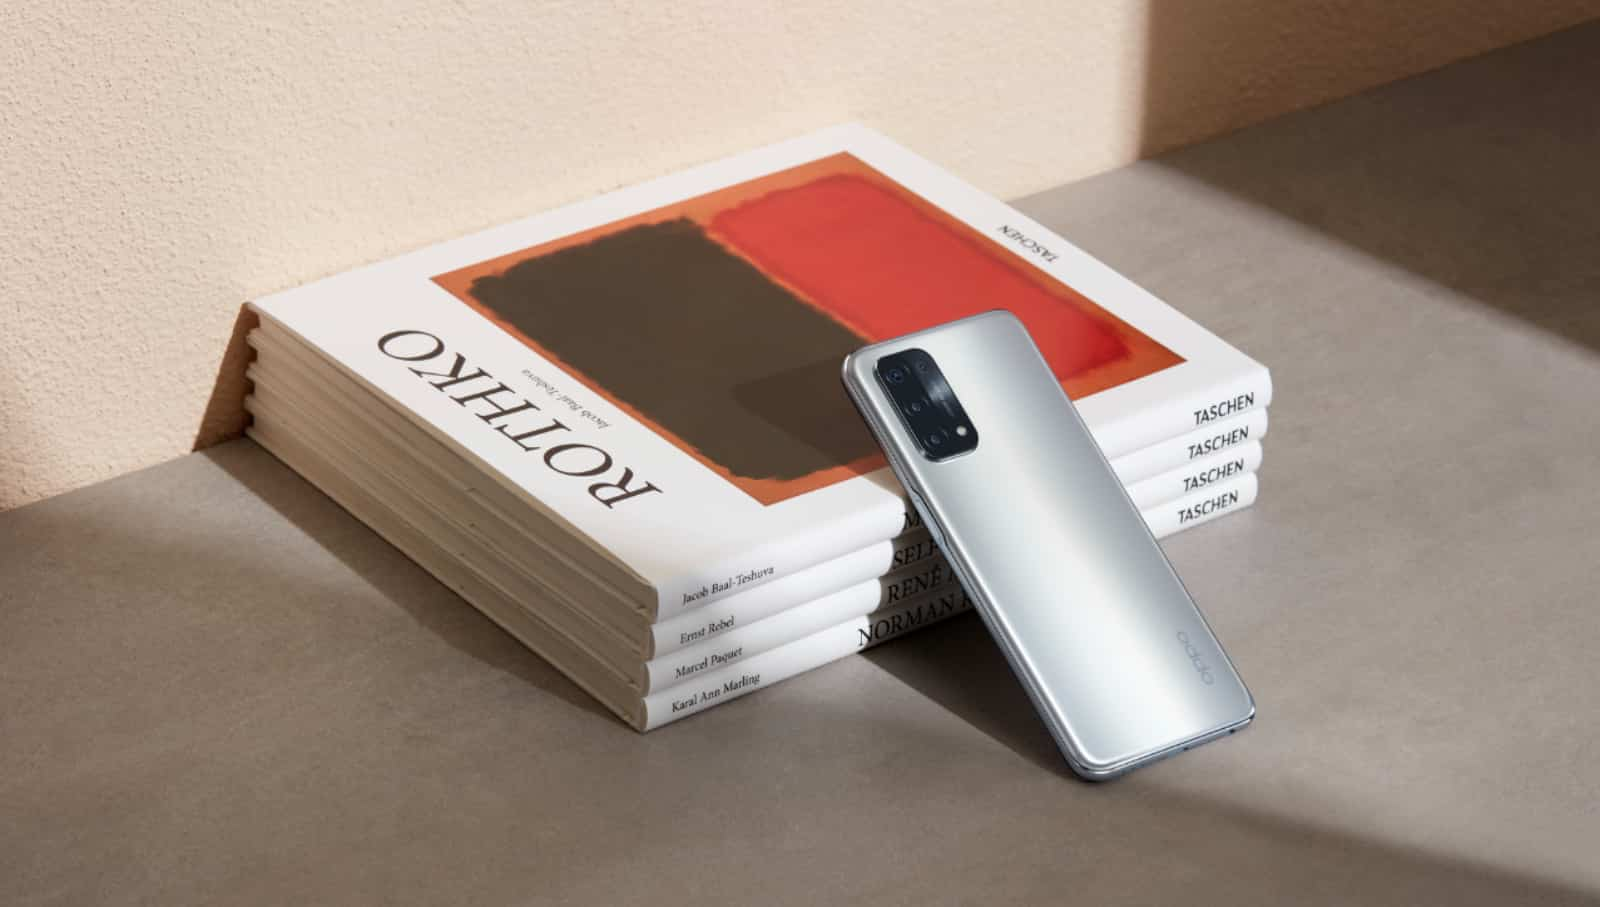 Oppo's A74 5G